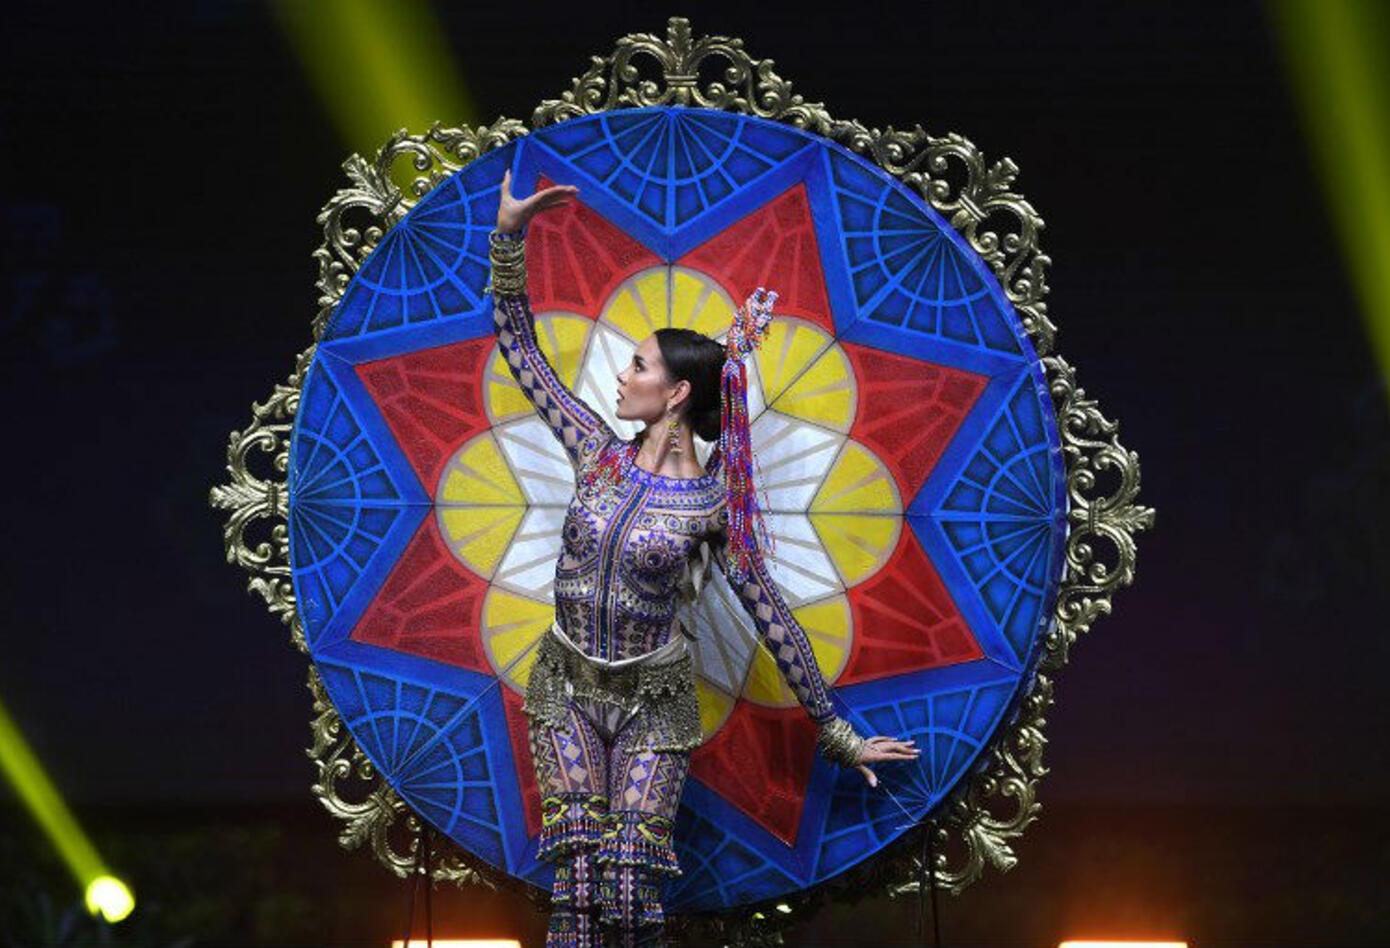 Traje típico de Catriona Gray, Miss Filipinas